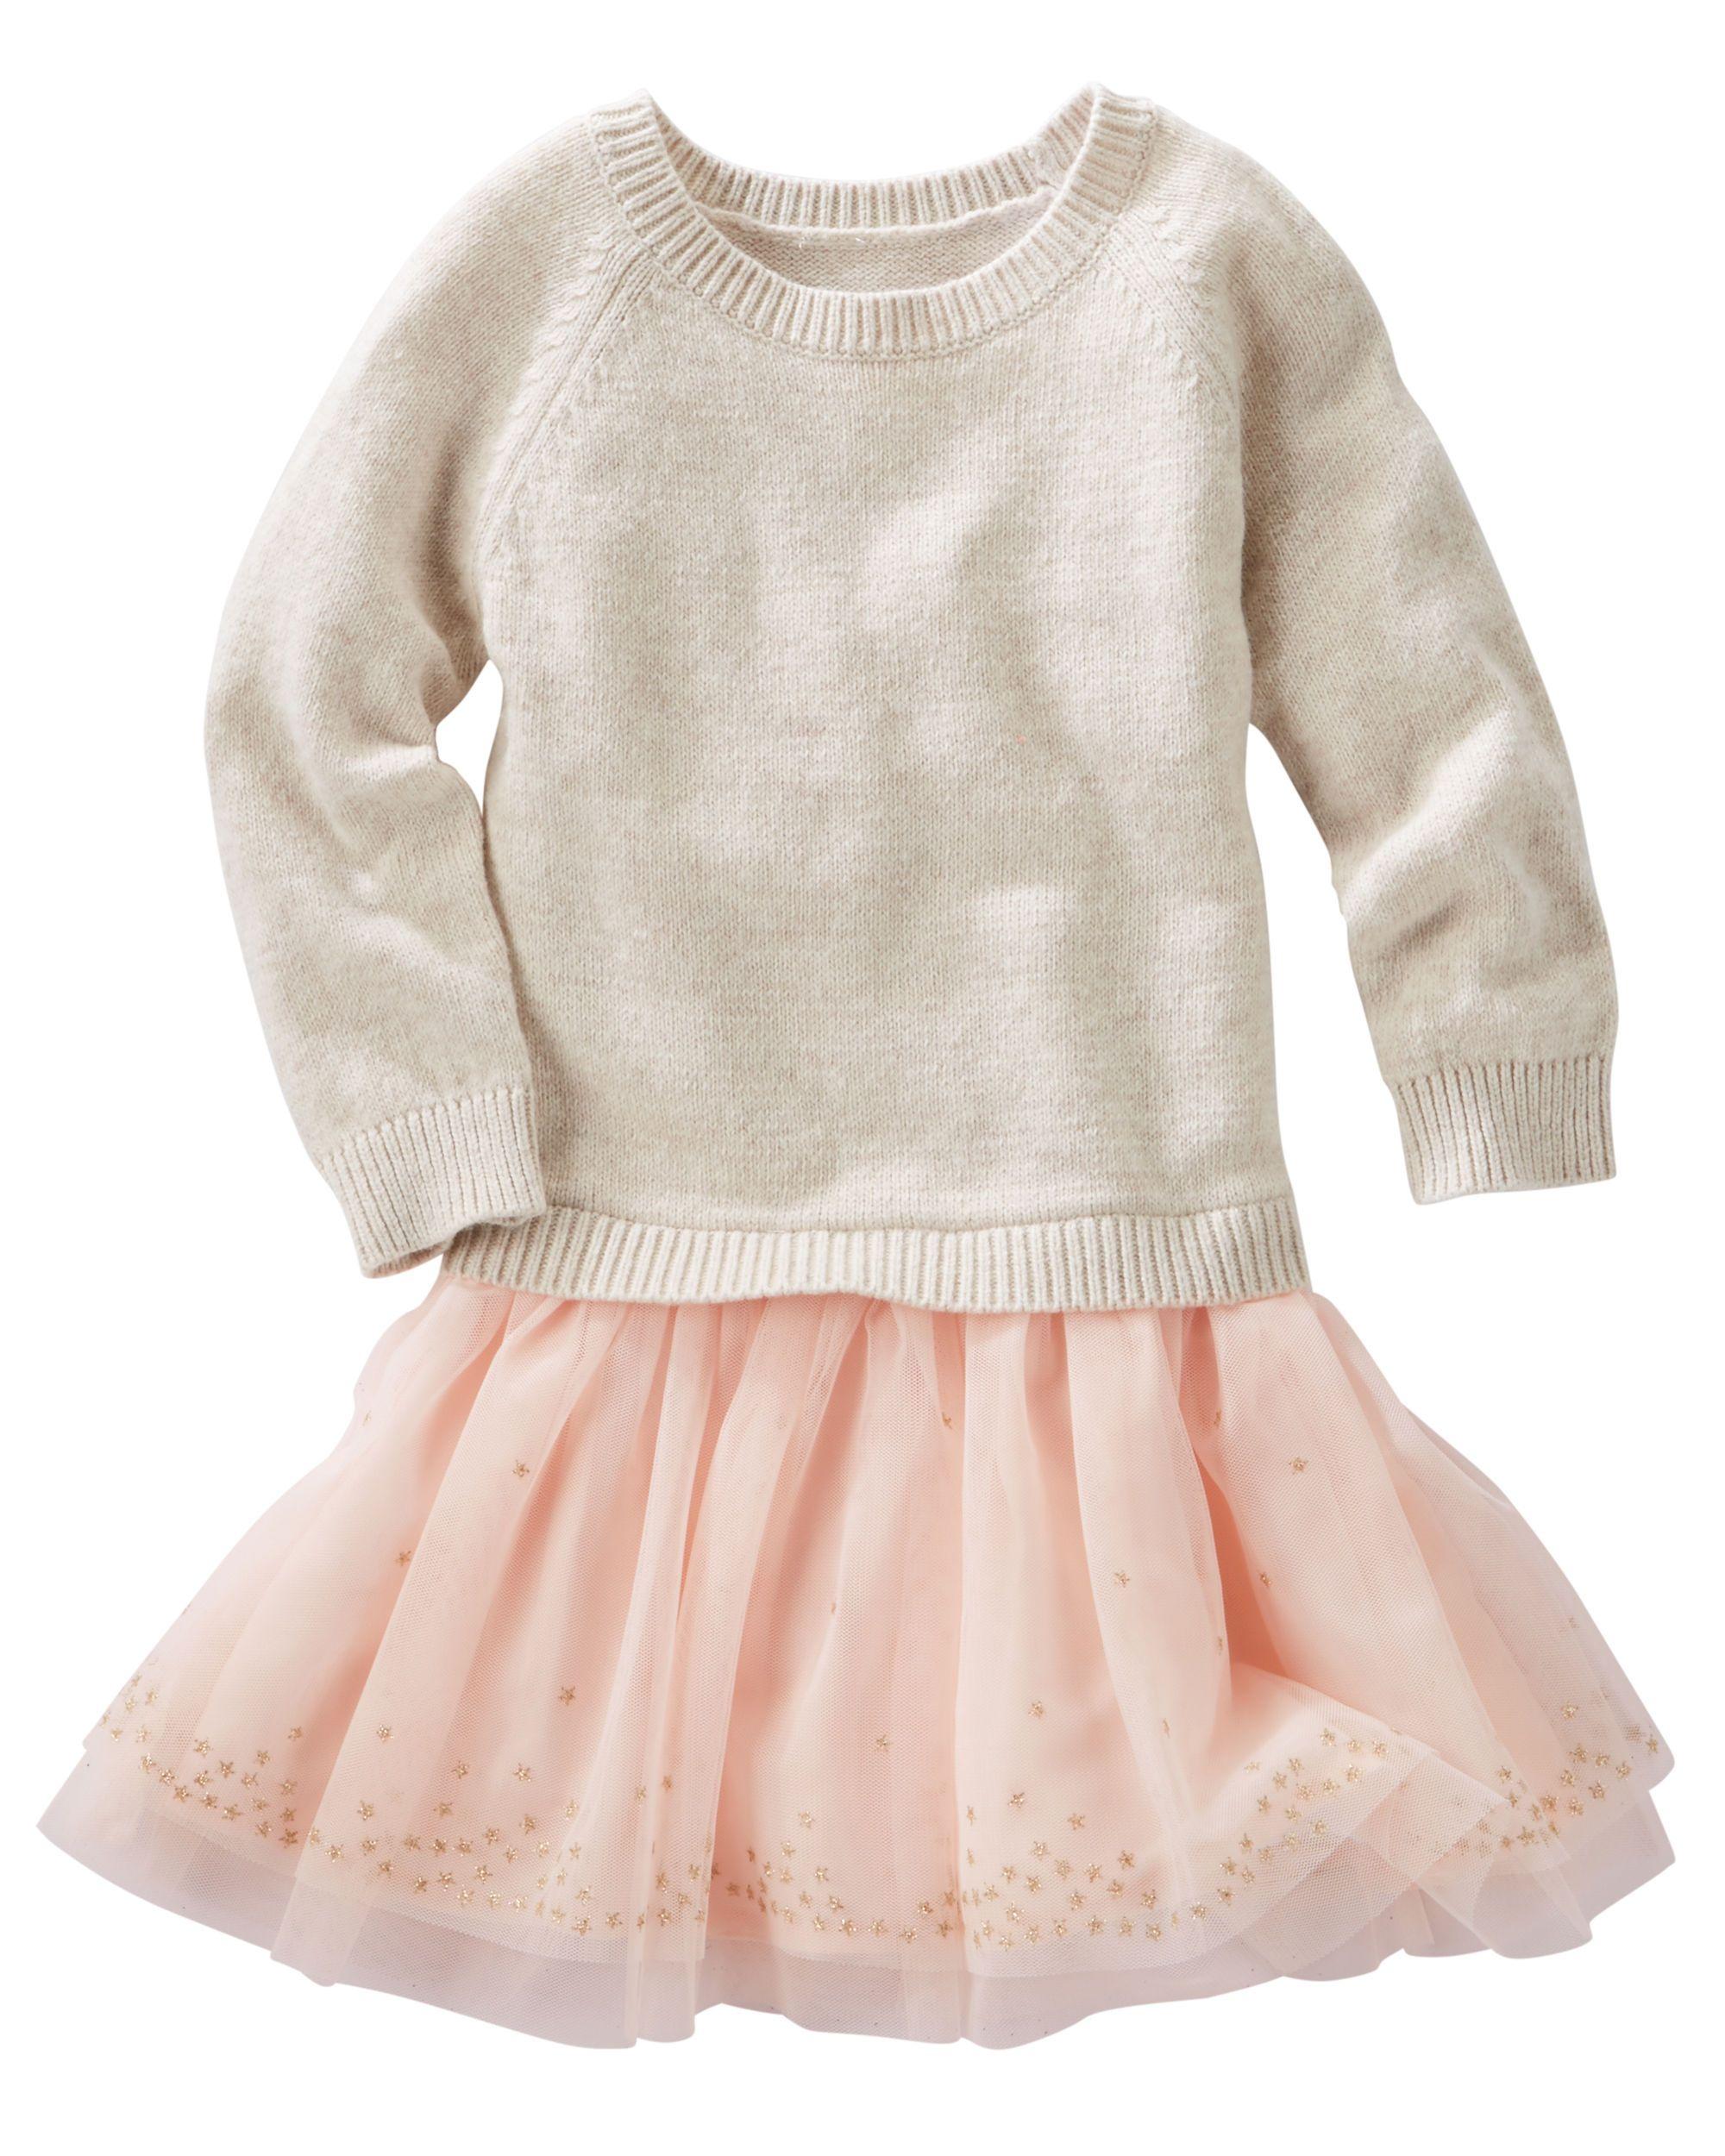 Kid Girl Mixed Sweater & Tulle Dress OshKosh